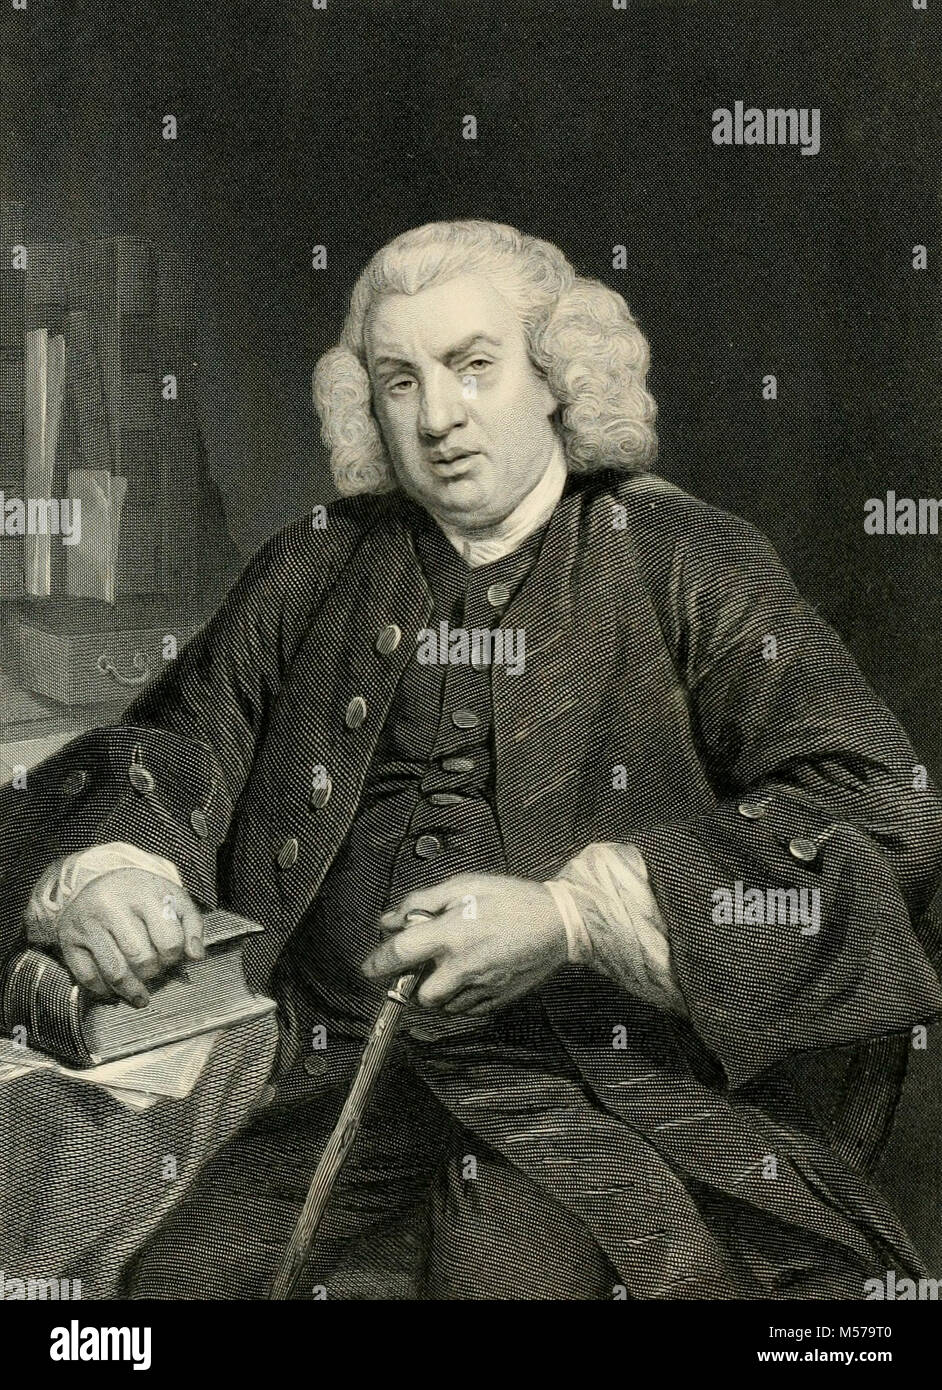 Samuel Johnson - English writer who made lasting contributions to English literature as a poet, essayist, moralist, - Stock Image